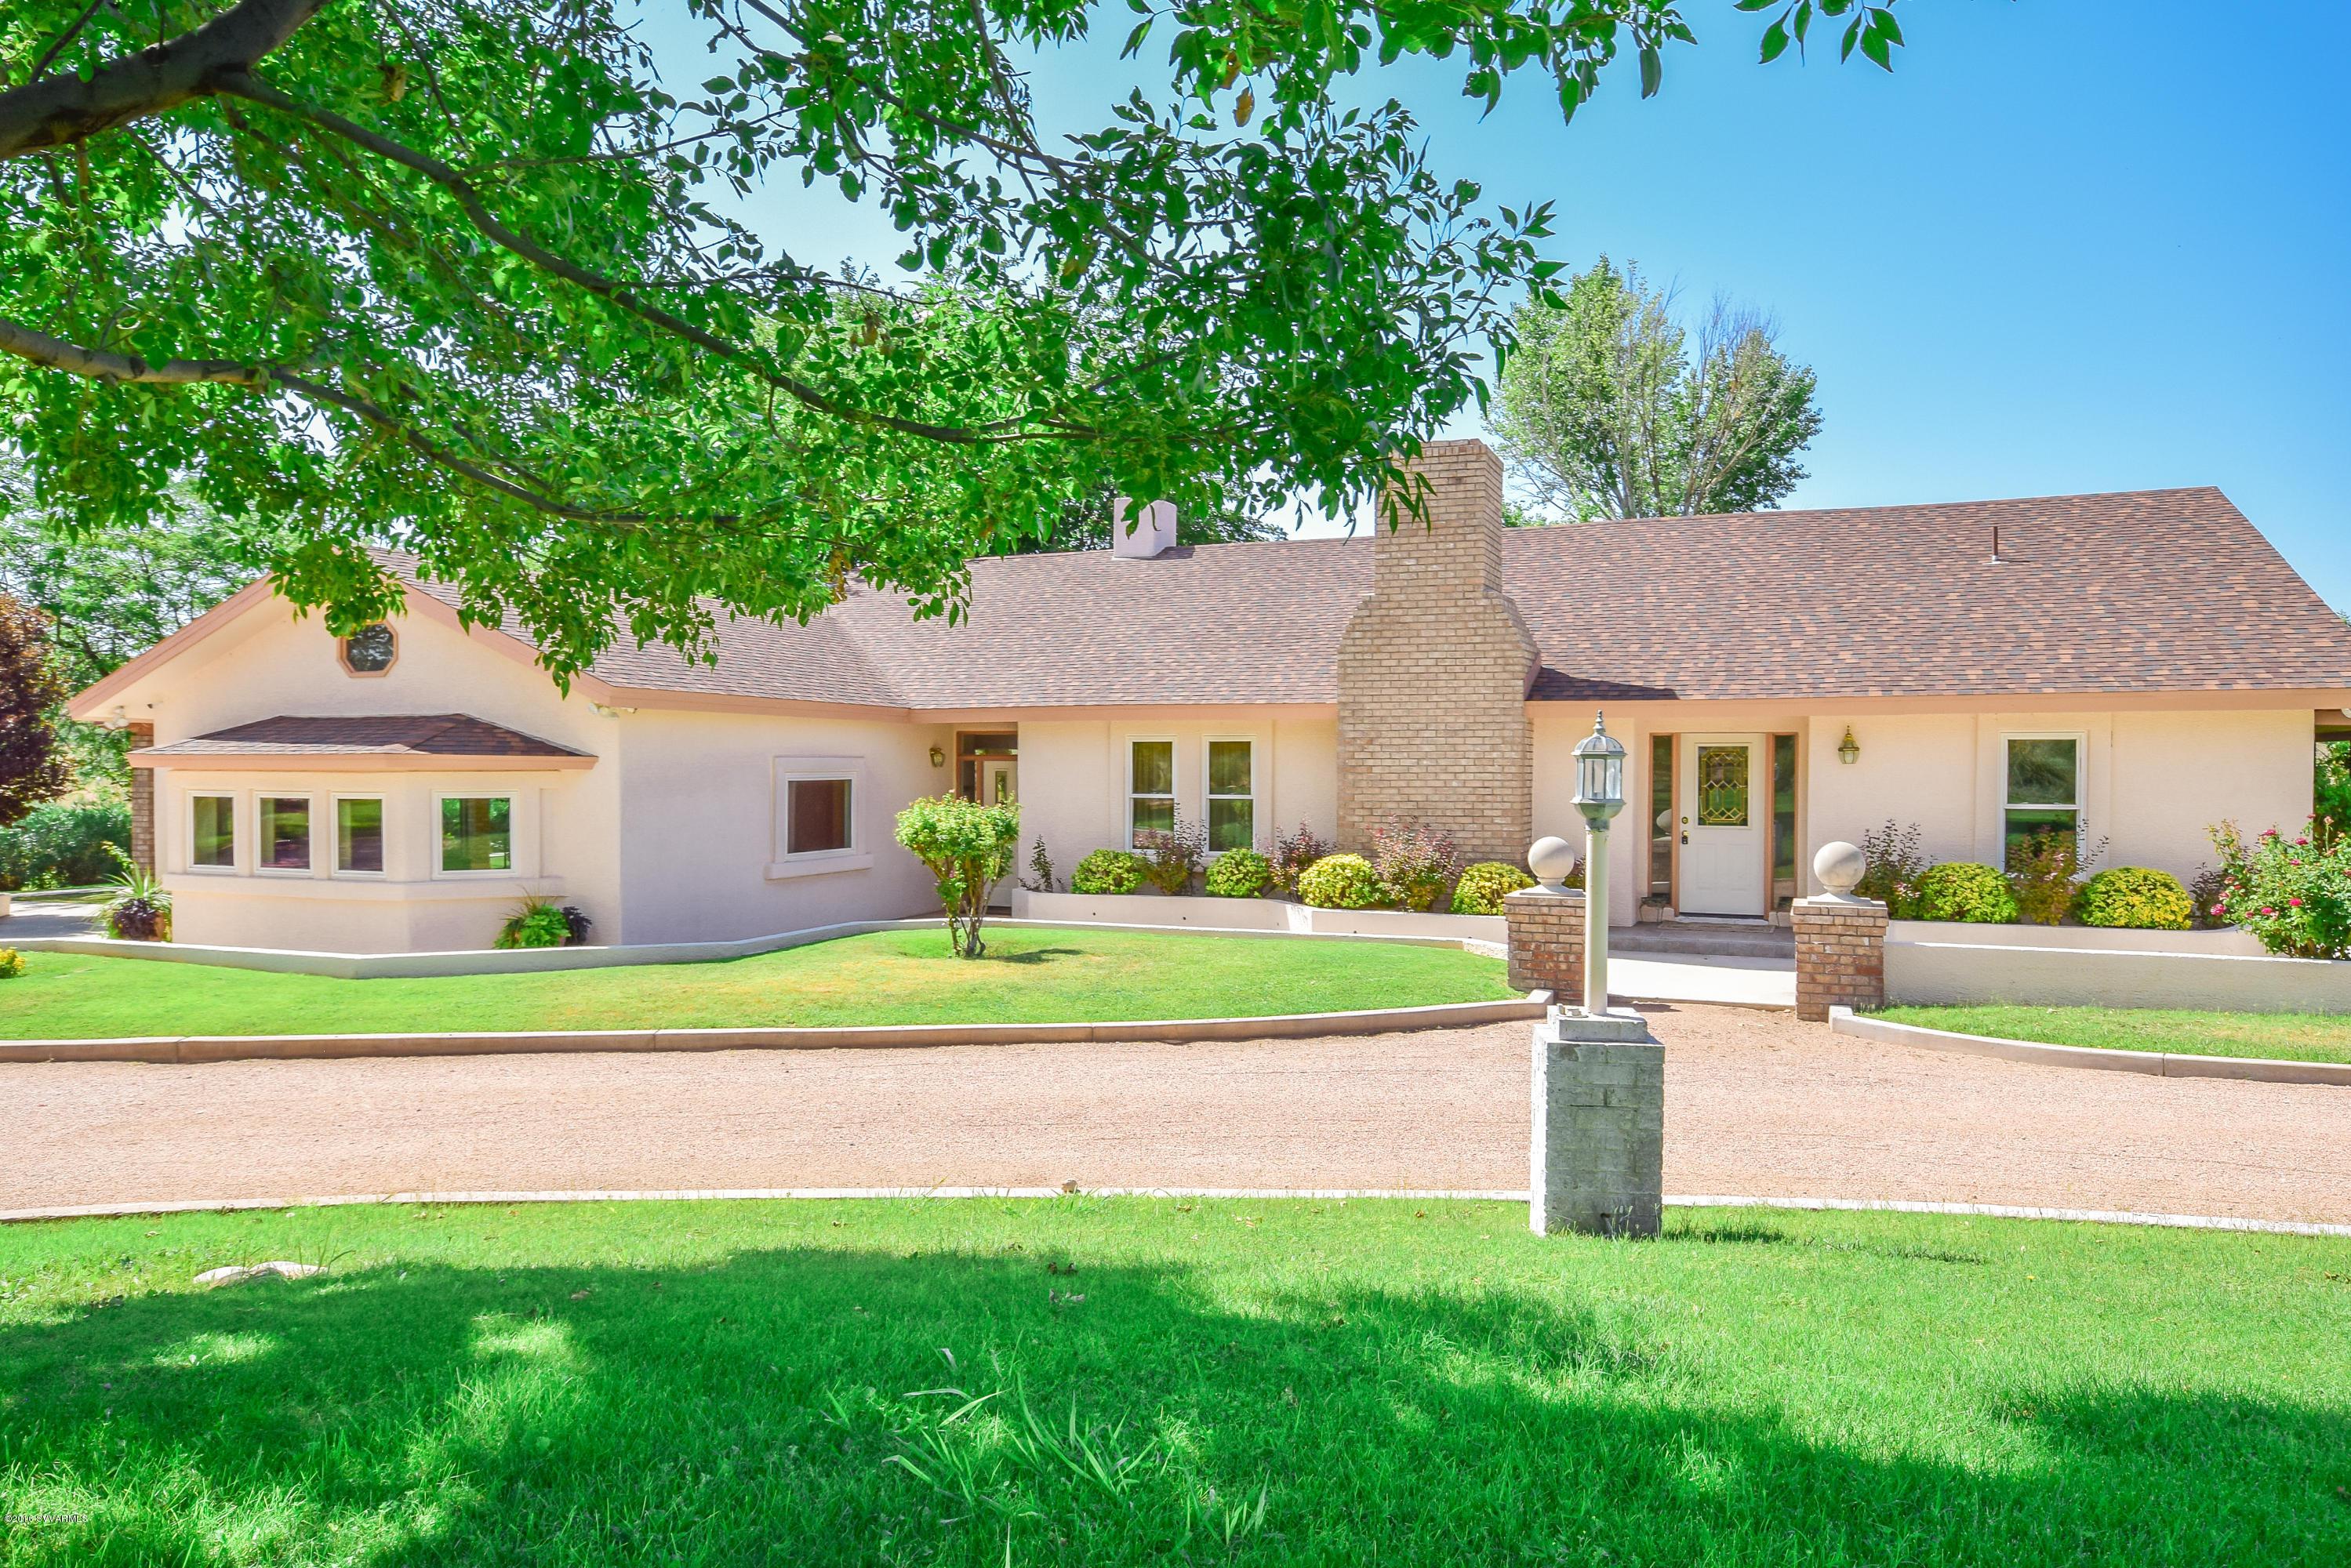 1950 S Equestrian Way Cornville, AZ 86325